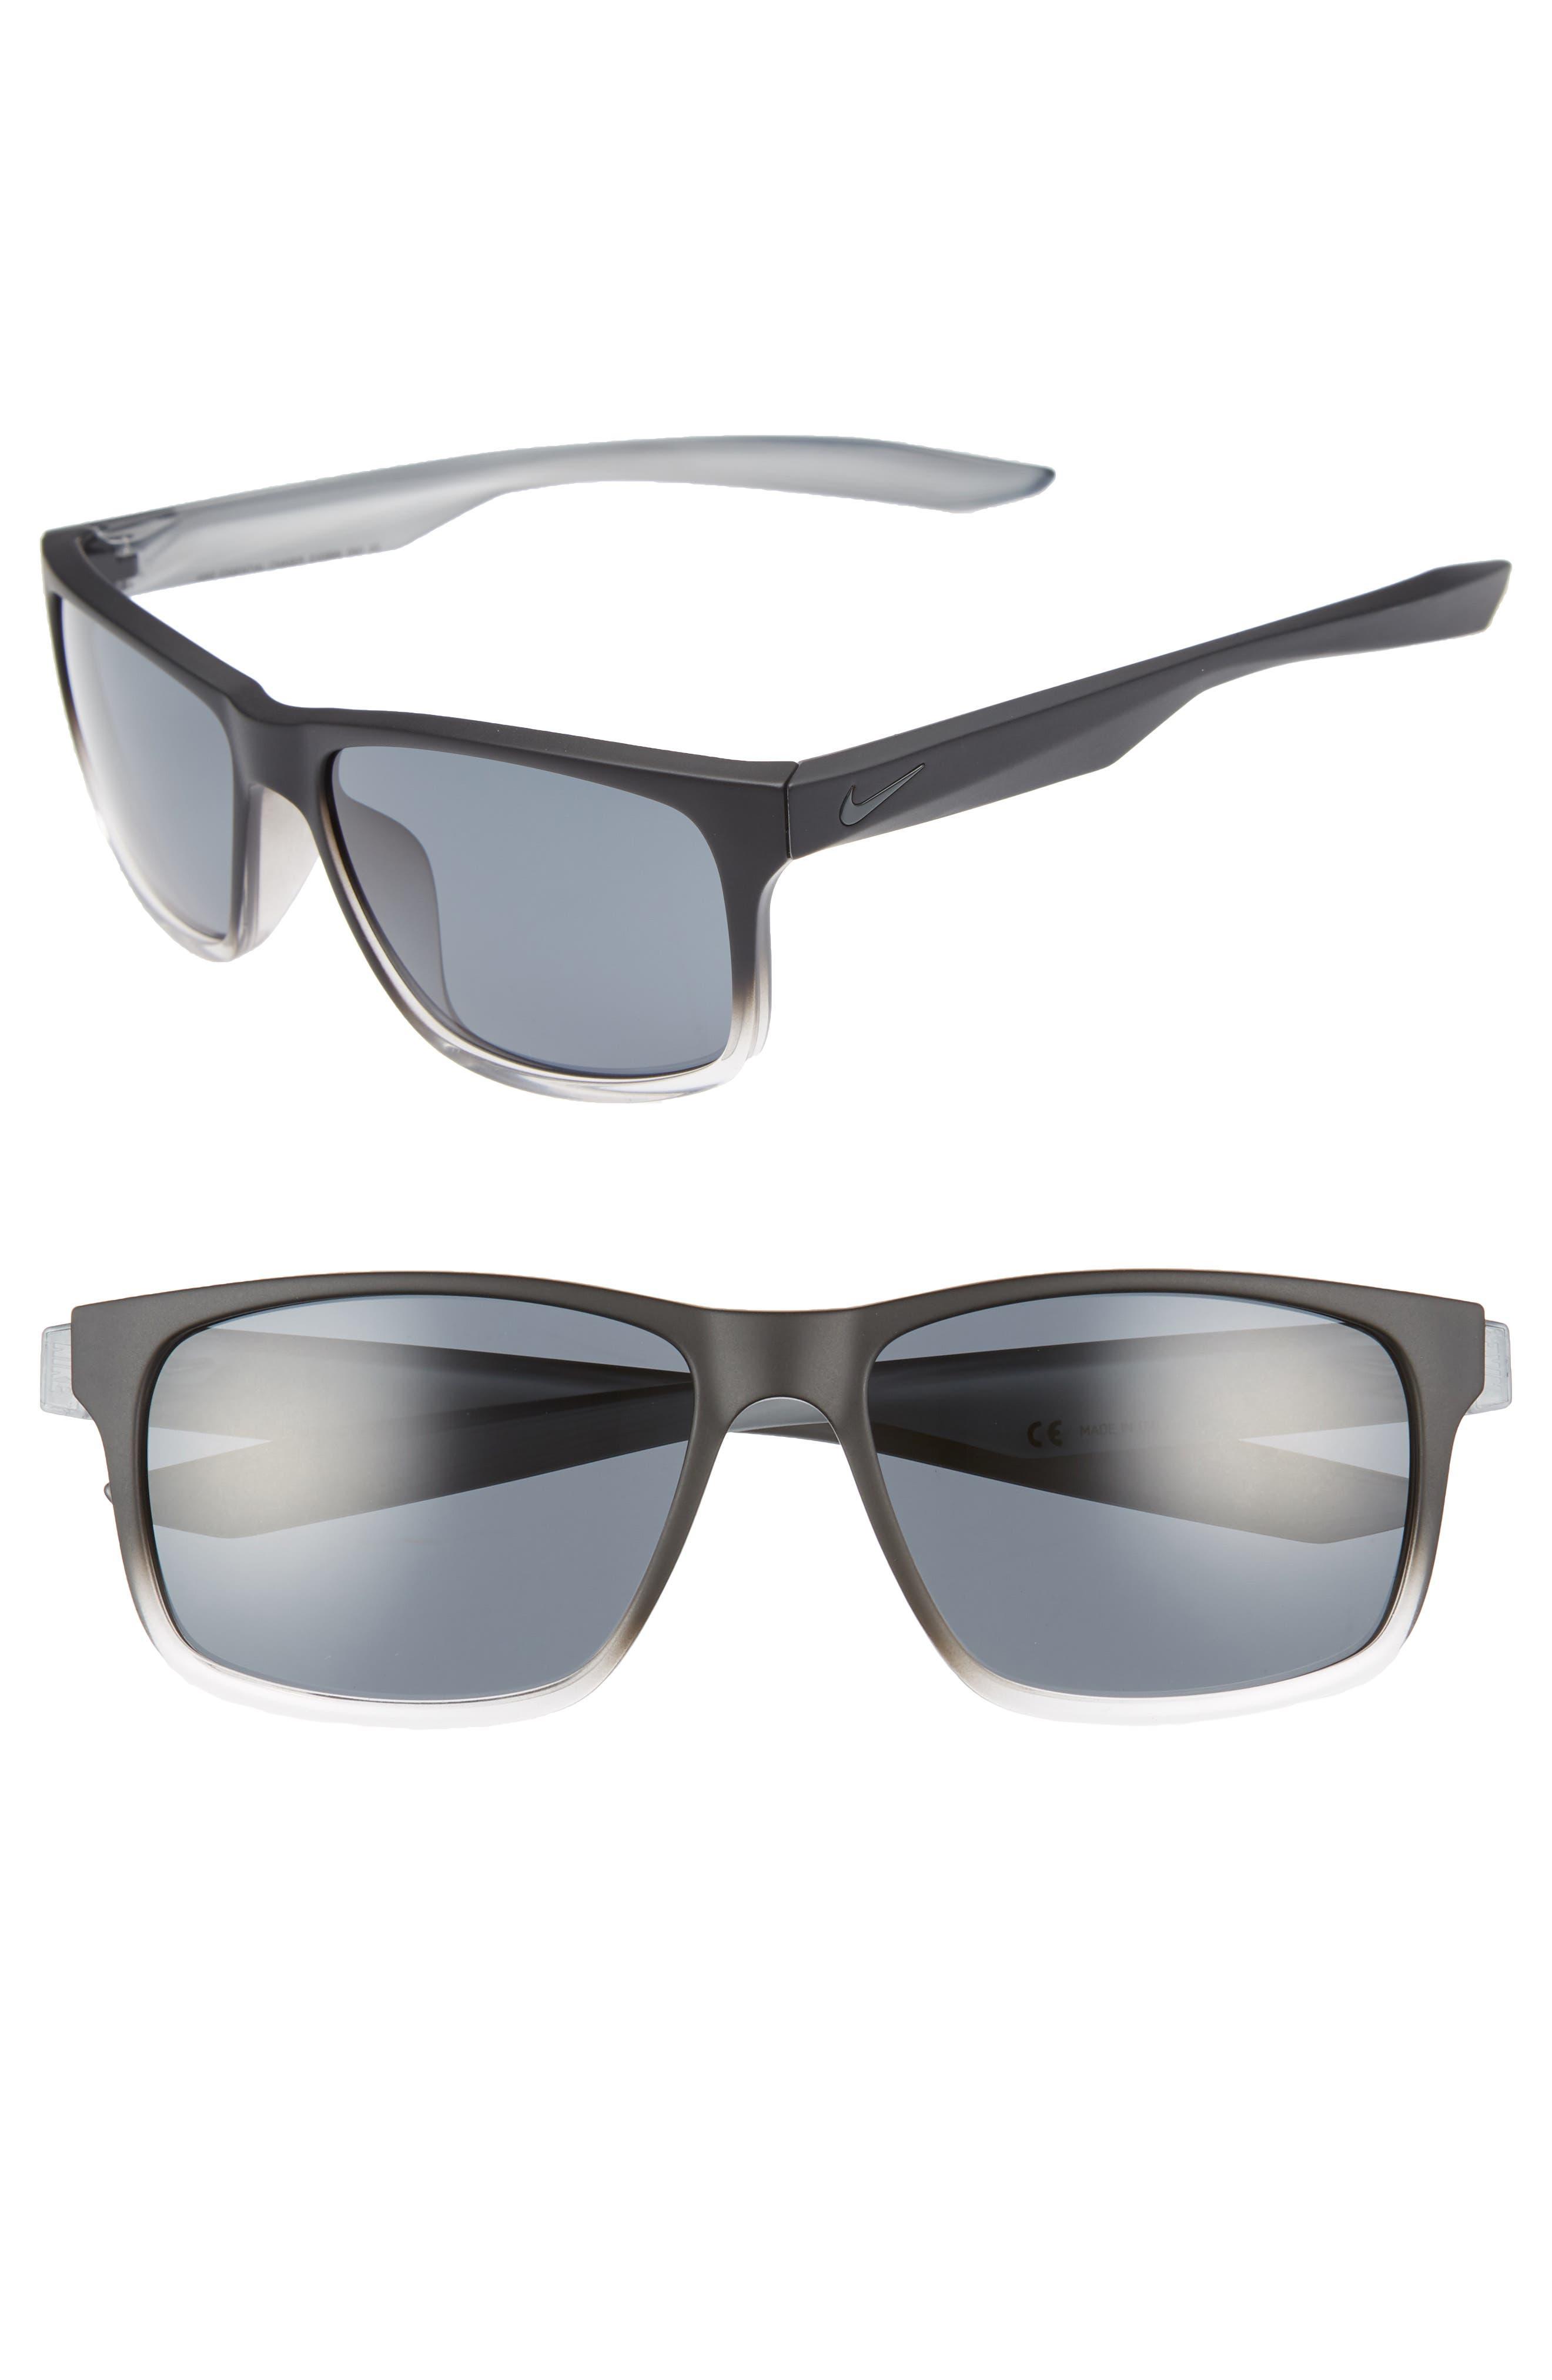 Nike Essential Chaser 5m Sunglasses - Matte Black Crystal/ Dark Grey